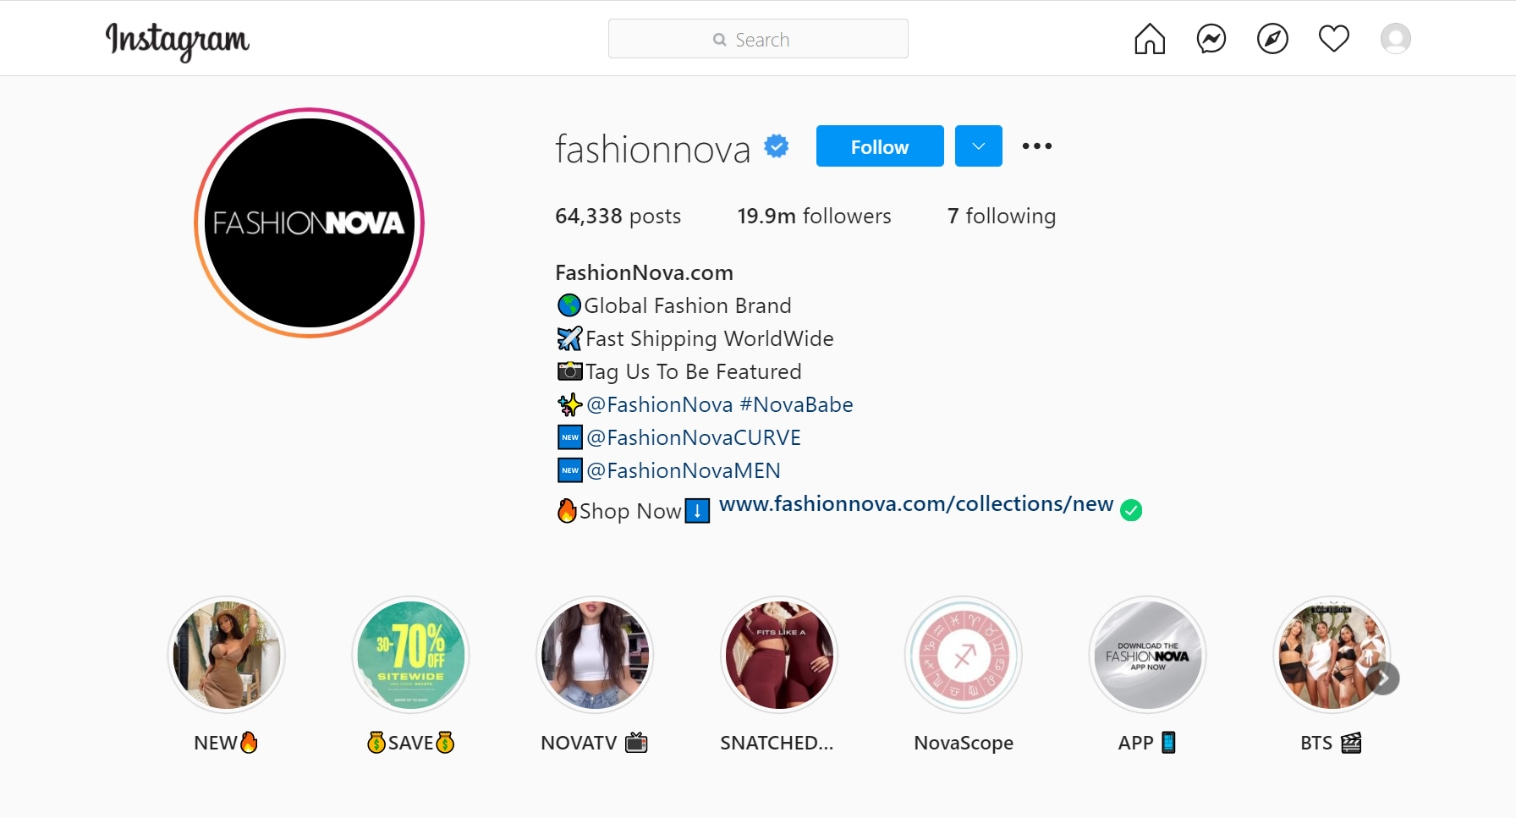 Fashion Nova instagram page